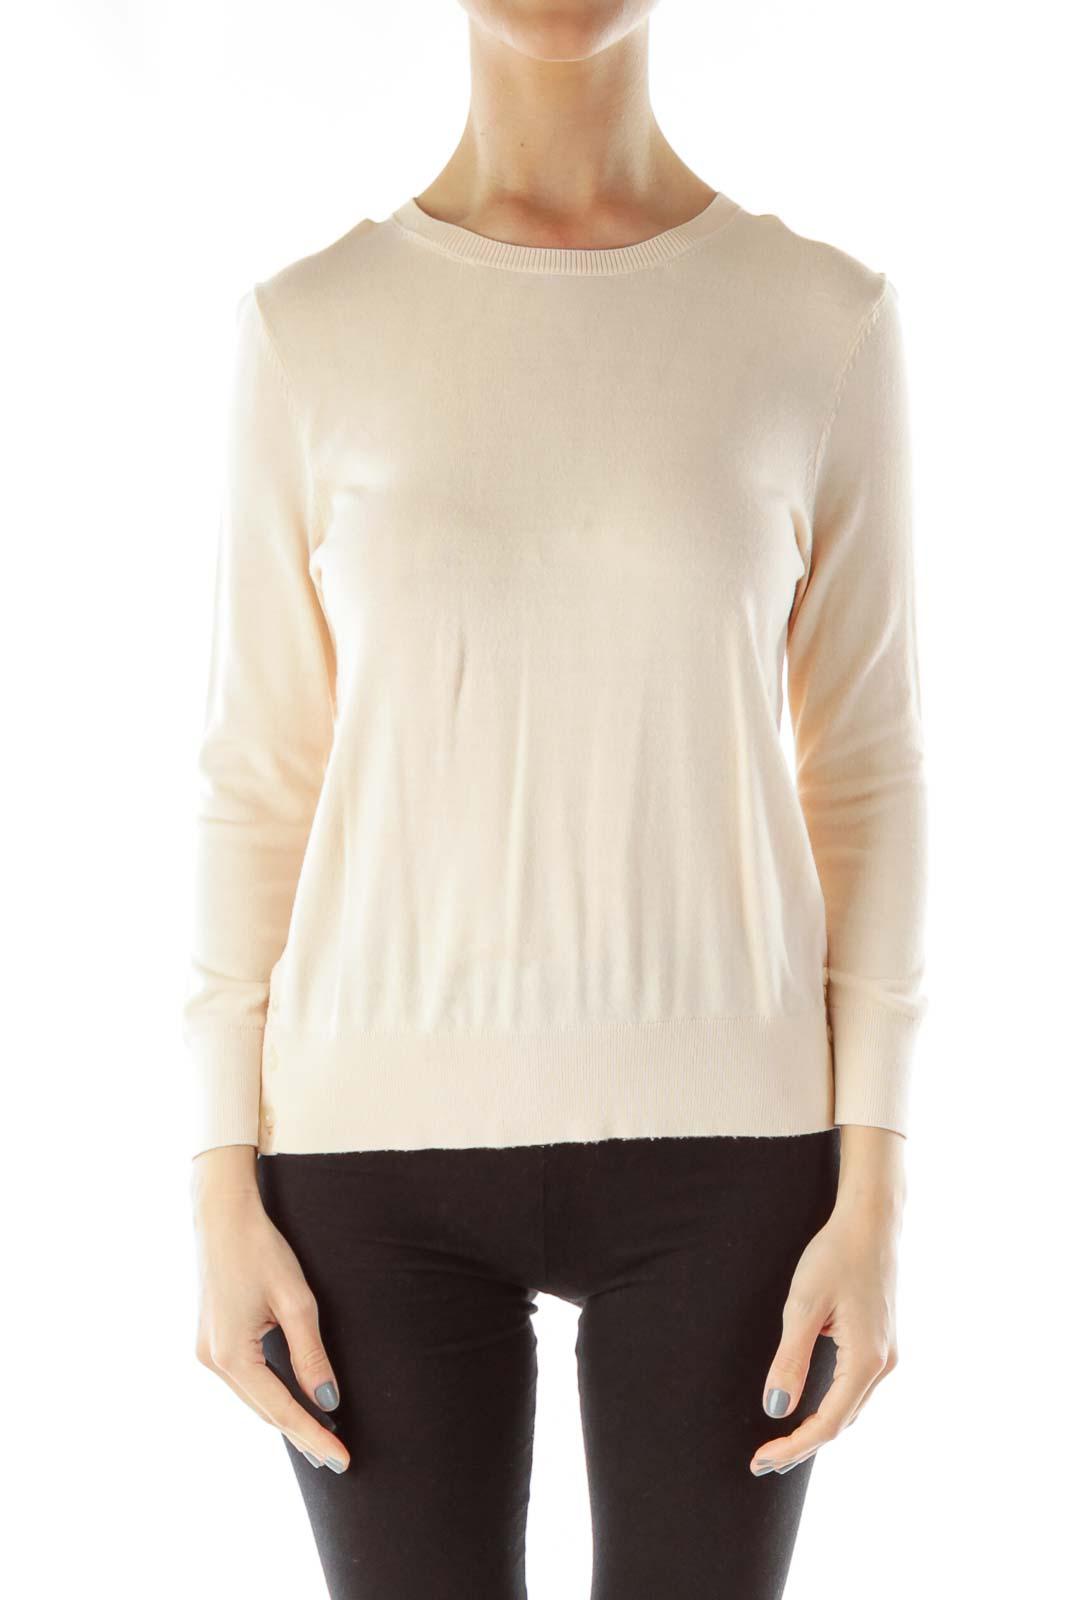 Pink 3/4 Sleeve Sweater